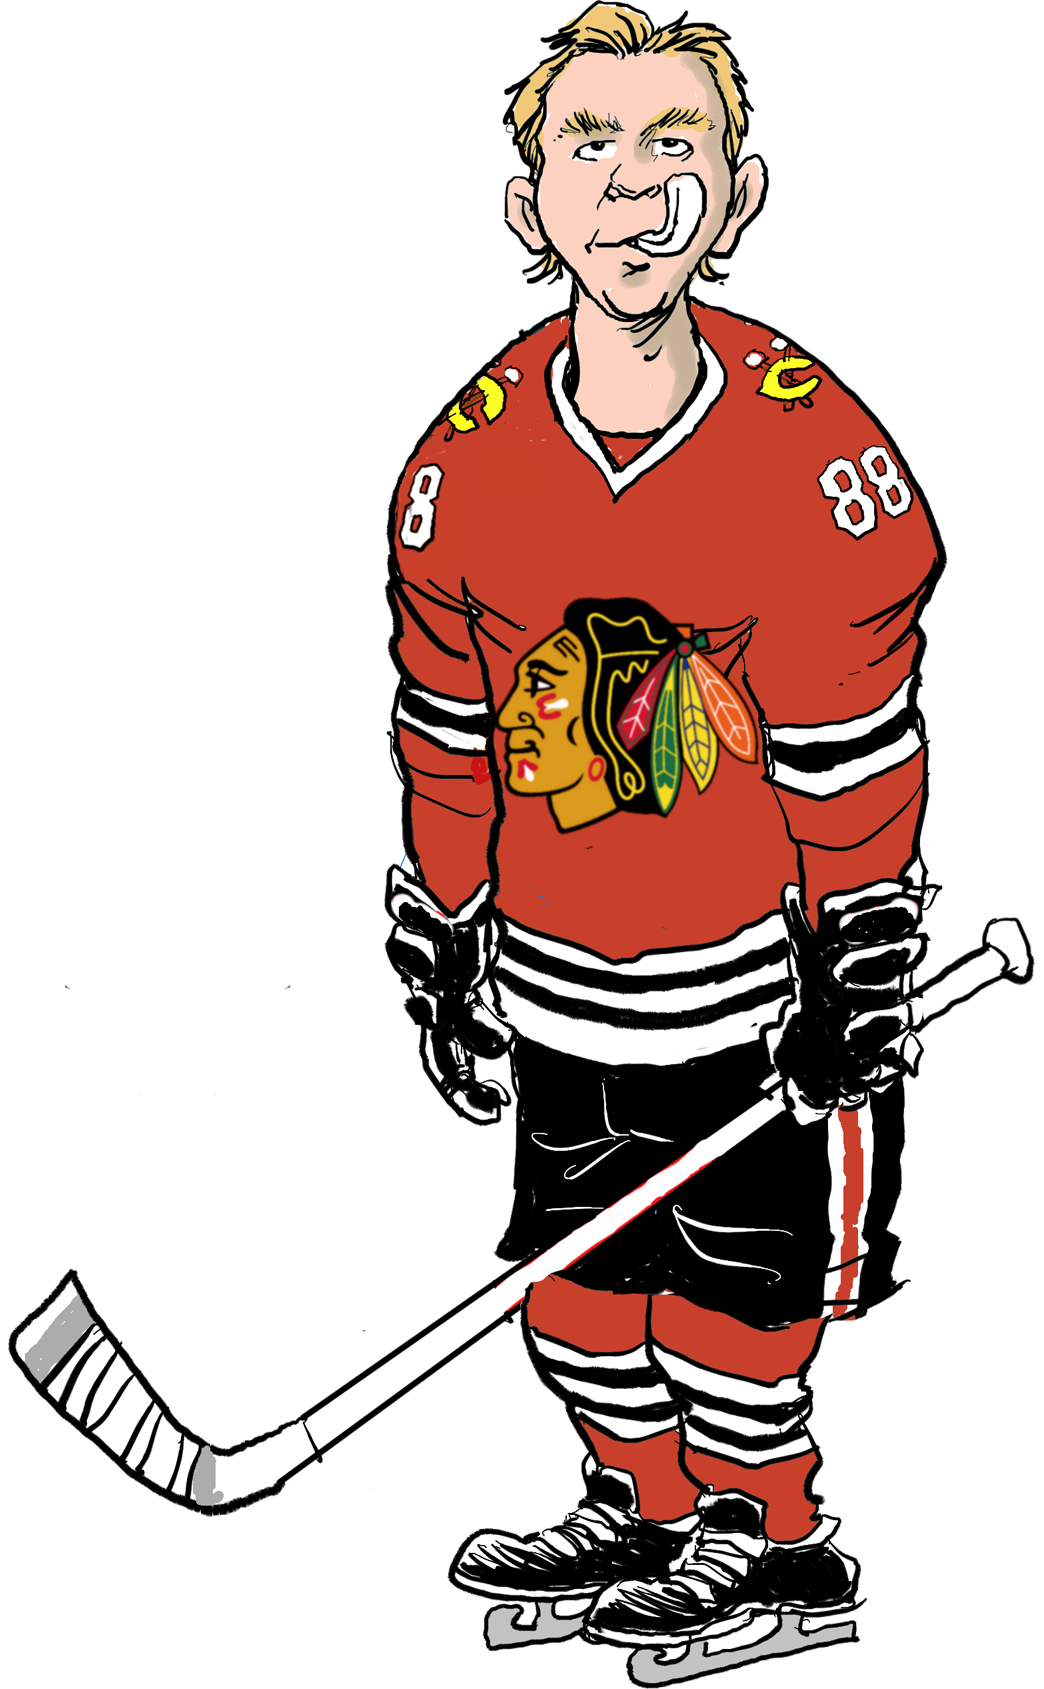 Hockey clipart hockey fan. Fakers guide blackhawks chicago